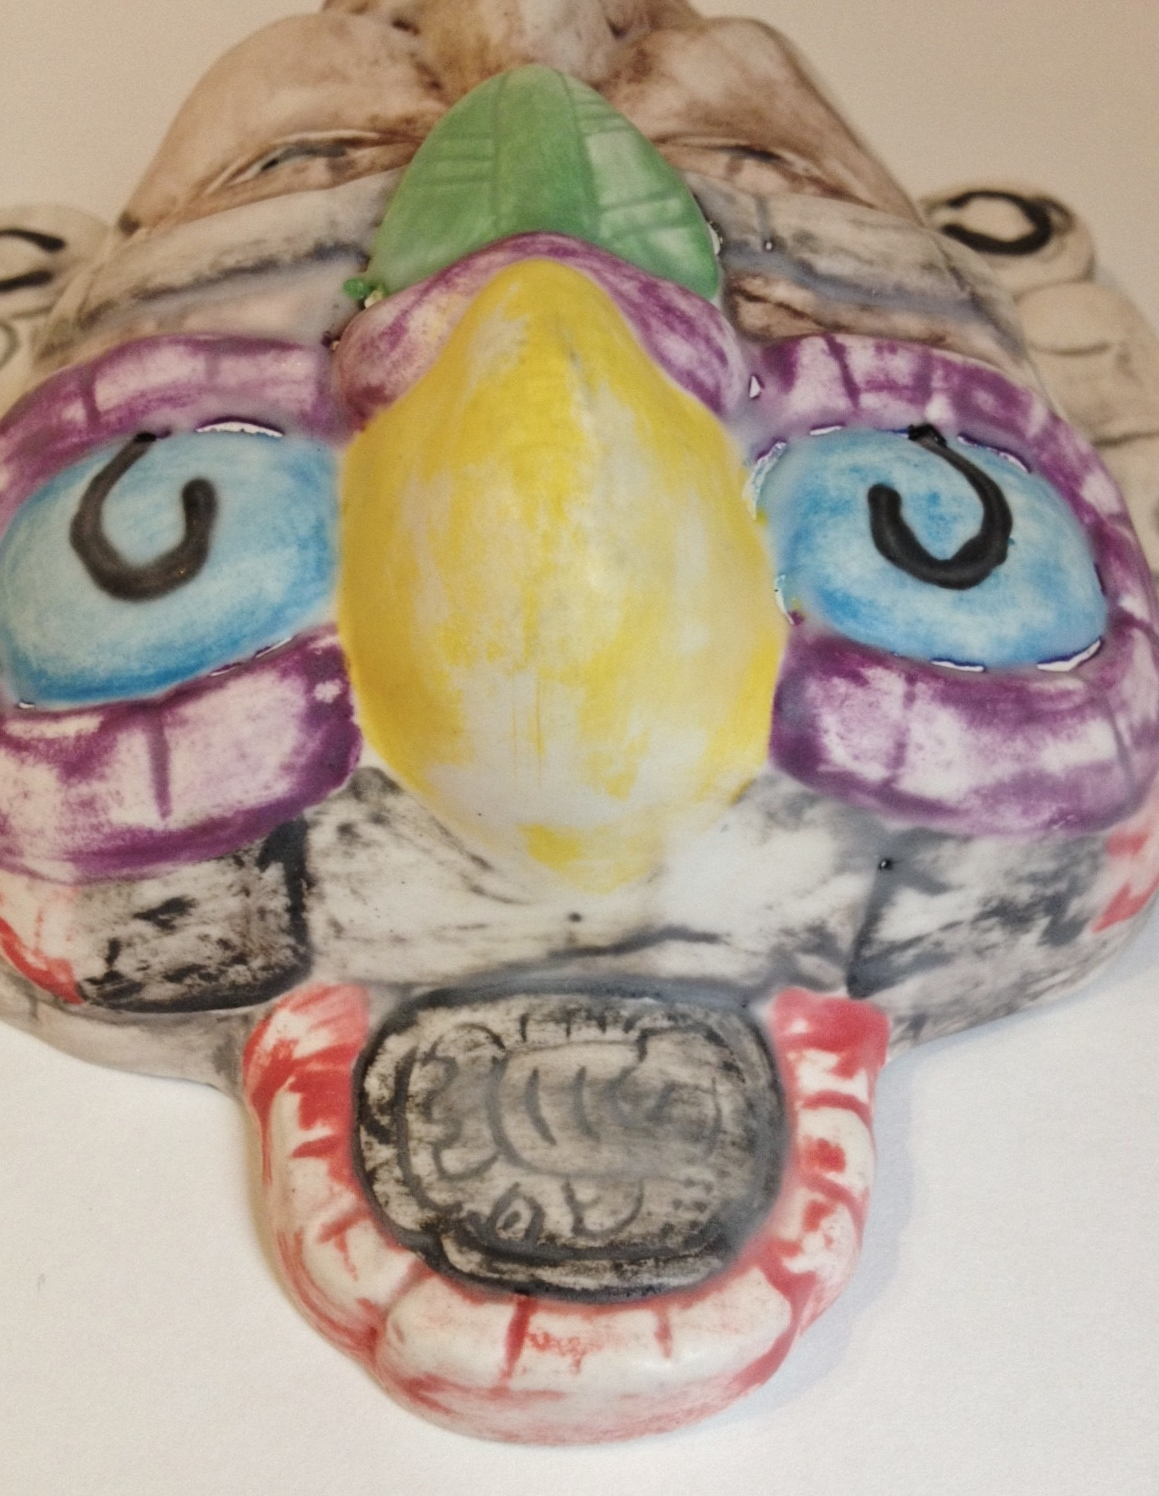 Tribal Bird Face Mask Collectible Porcelain and 50 similar items